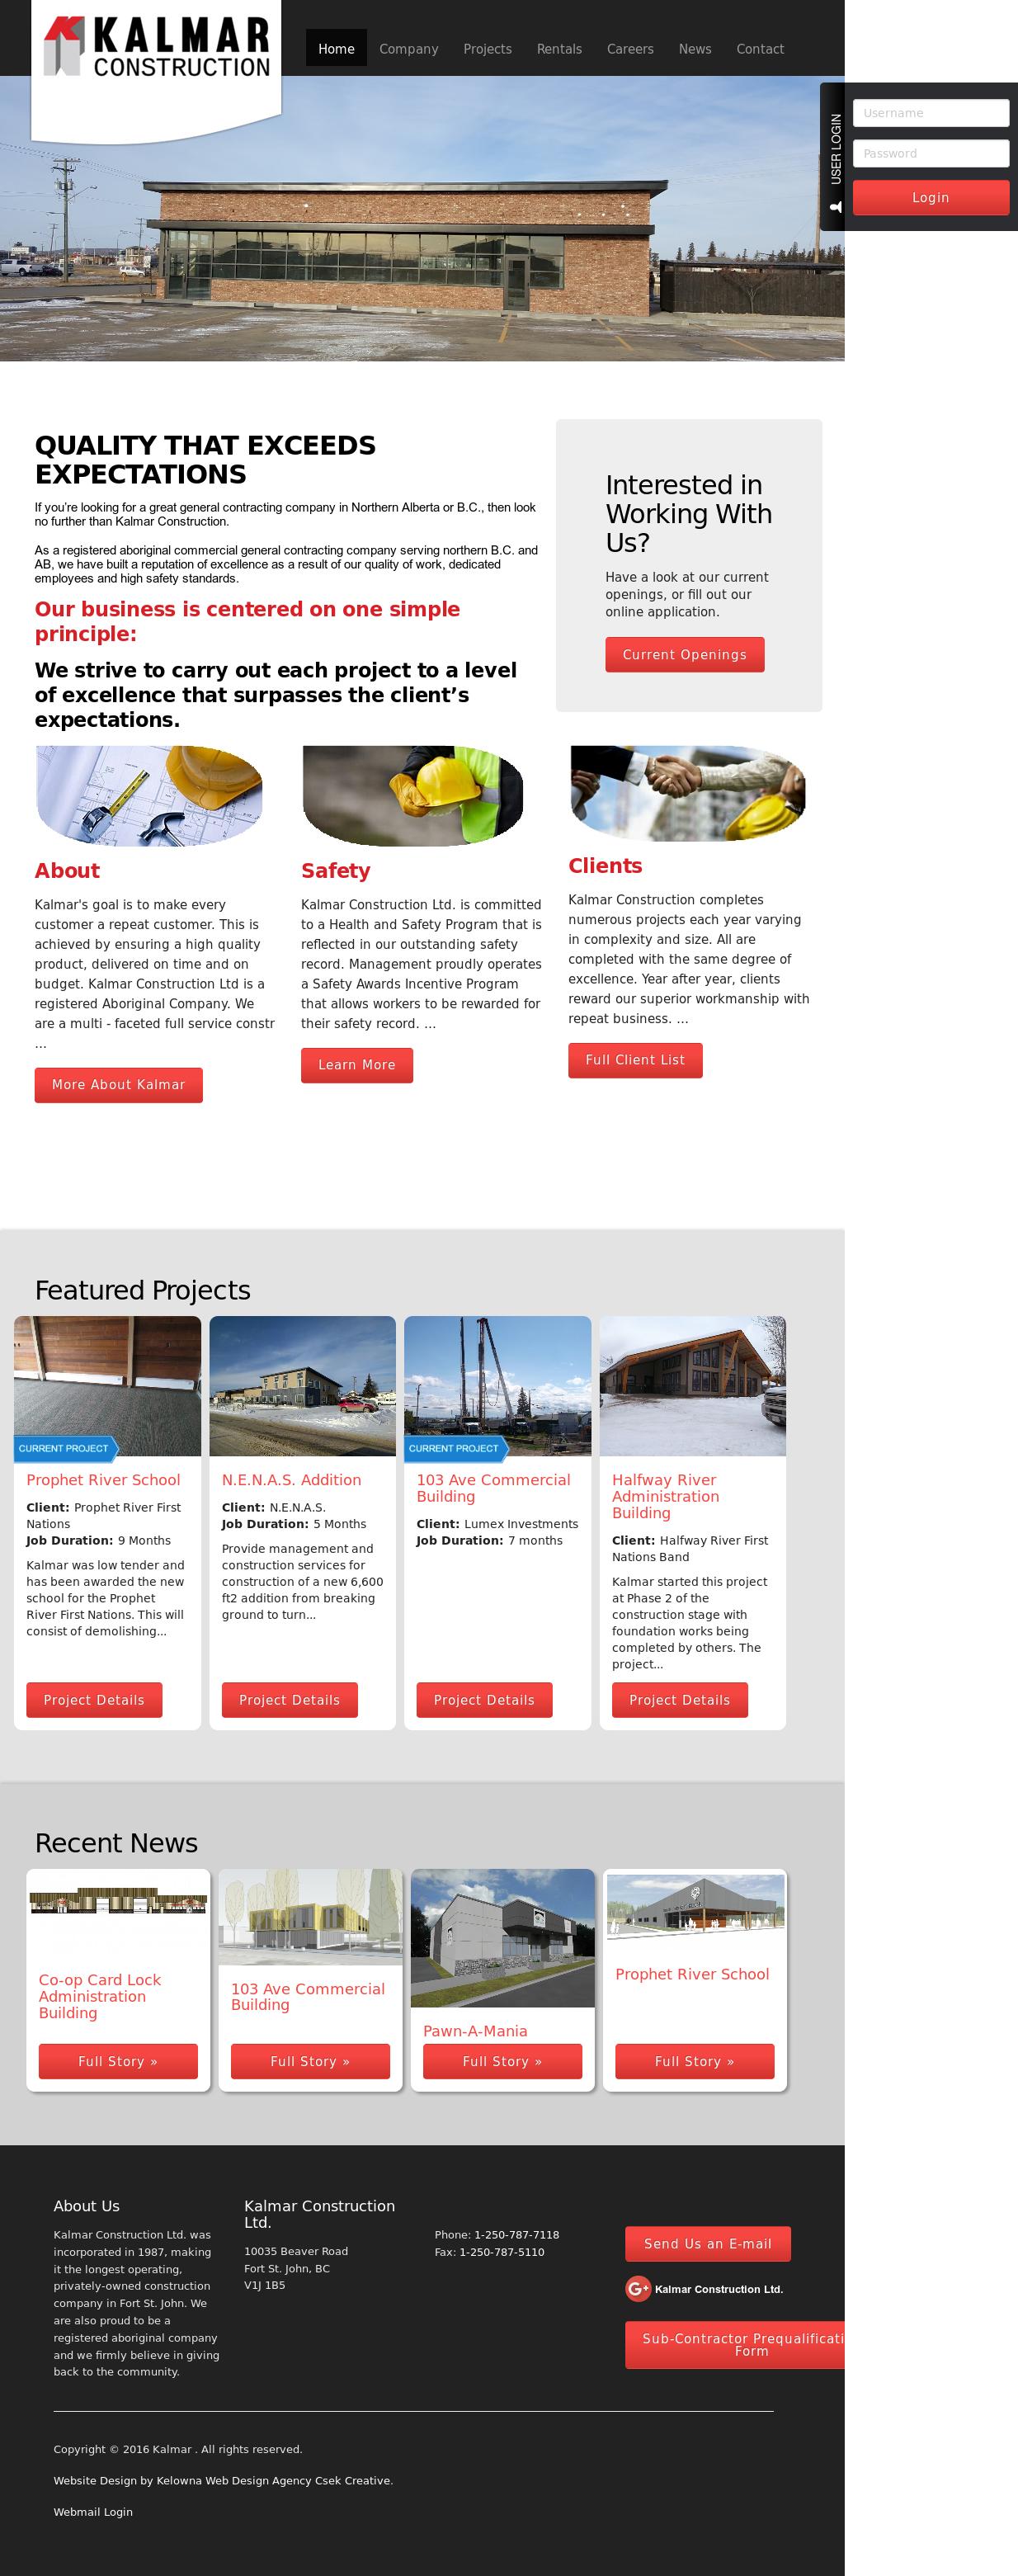 Kalmar Construction Competitors, Revenue and Employees